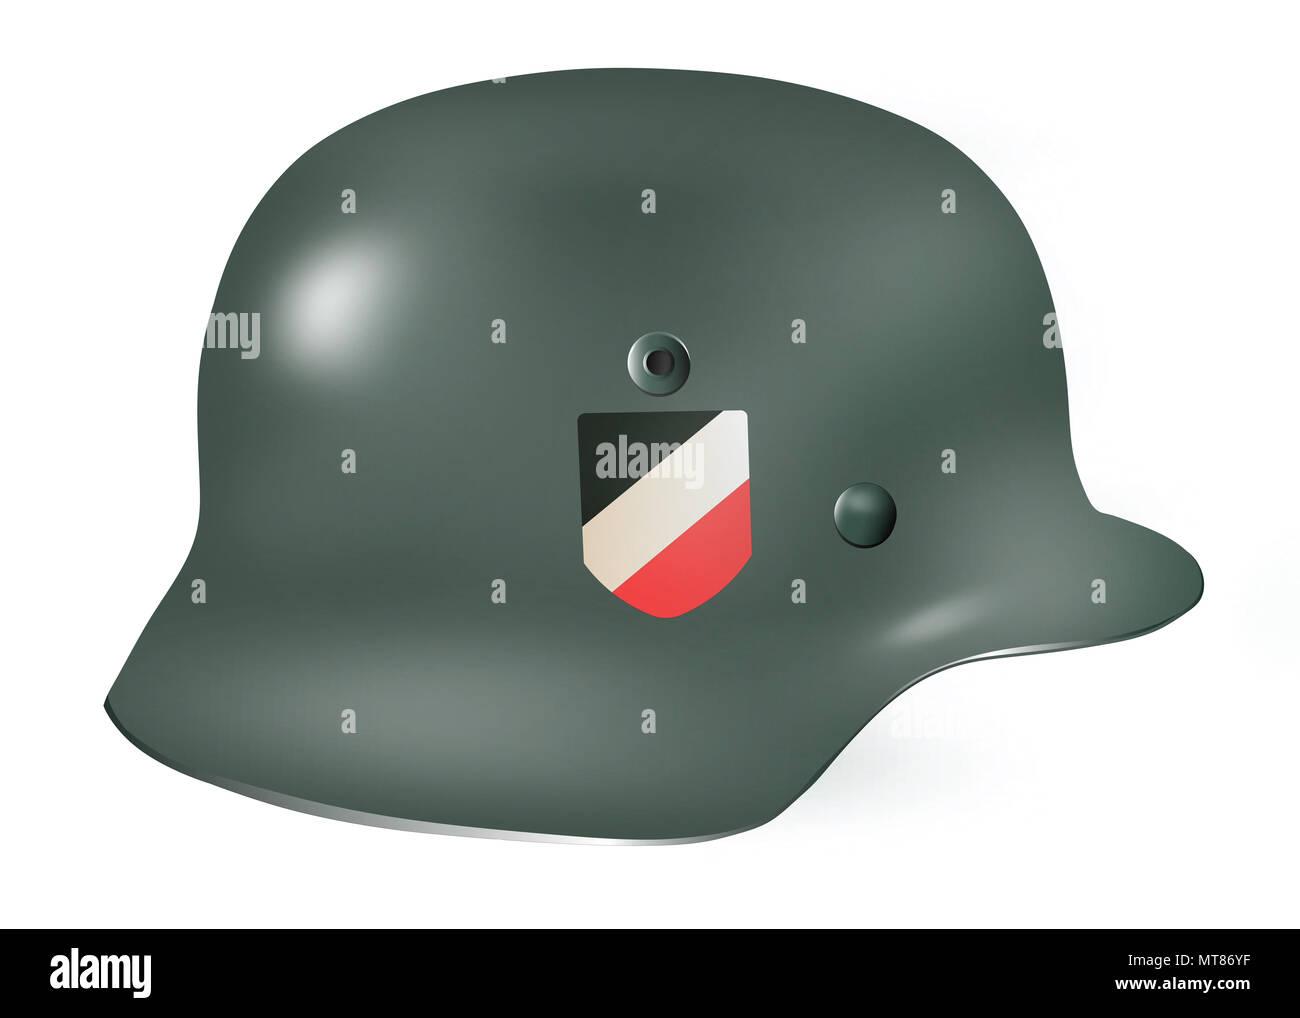 German Helmet Stock Photos & German Helmet Stock Images - Alamy